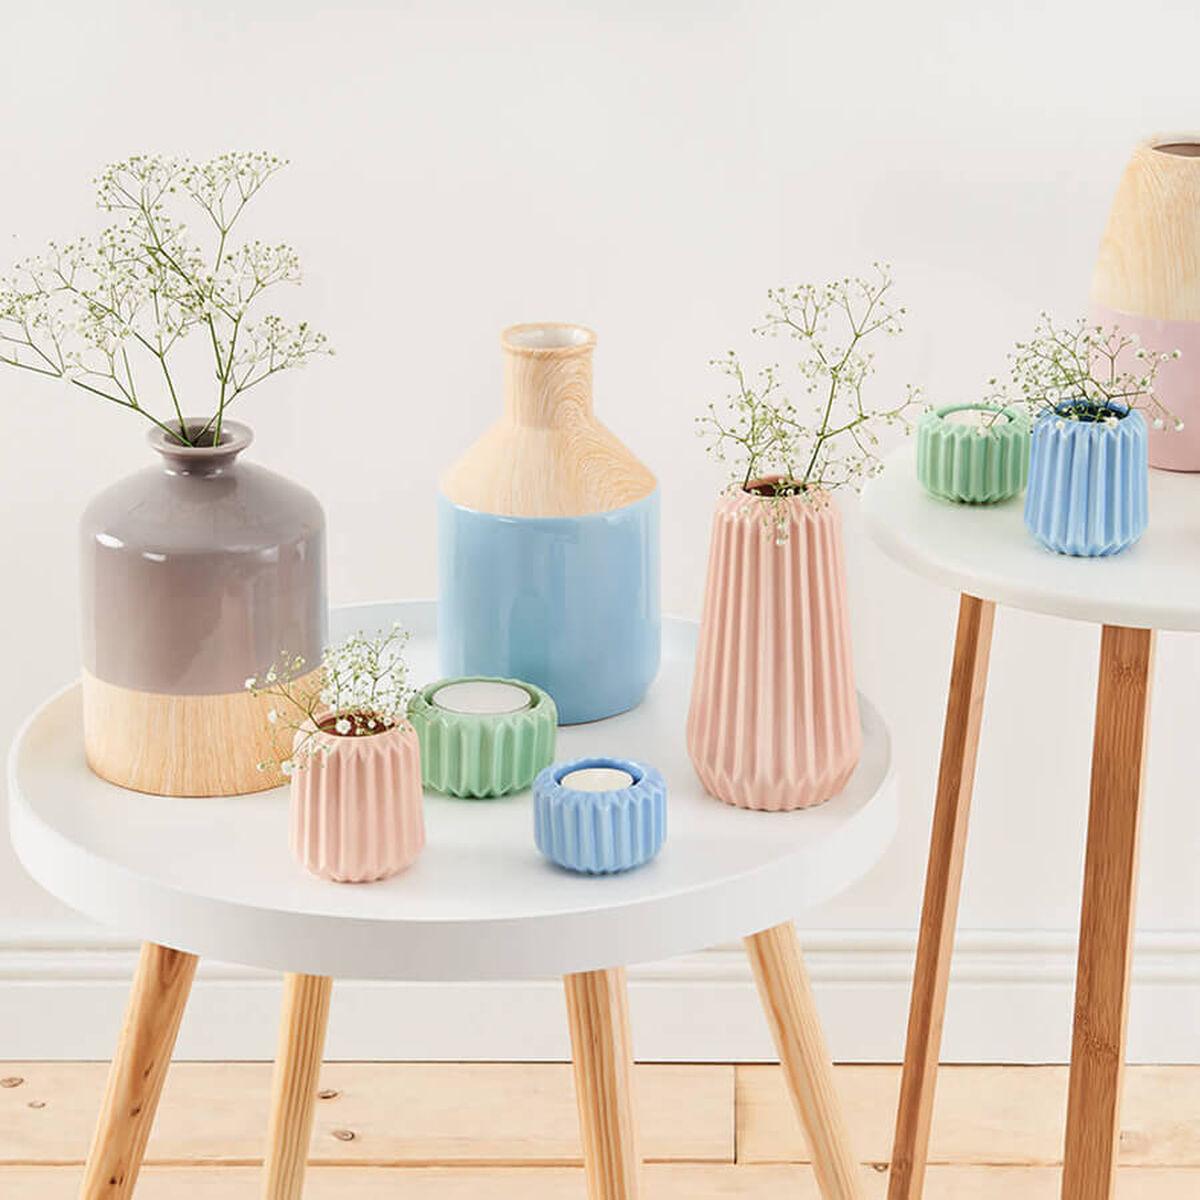 pastell butlers. Black Bedroom Furniture Sets. Home Design Ideas